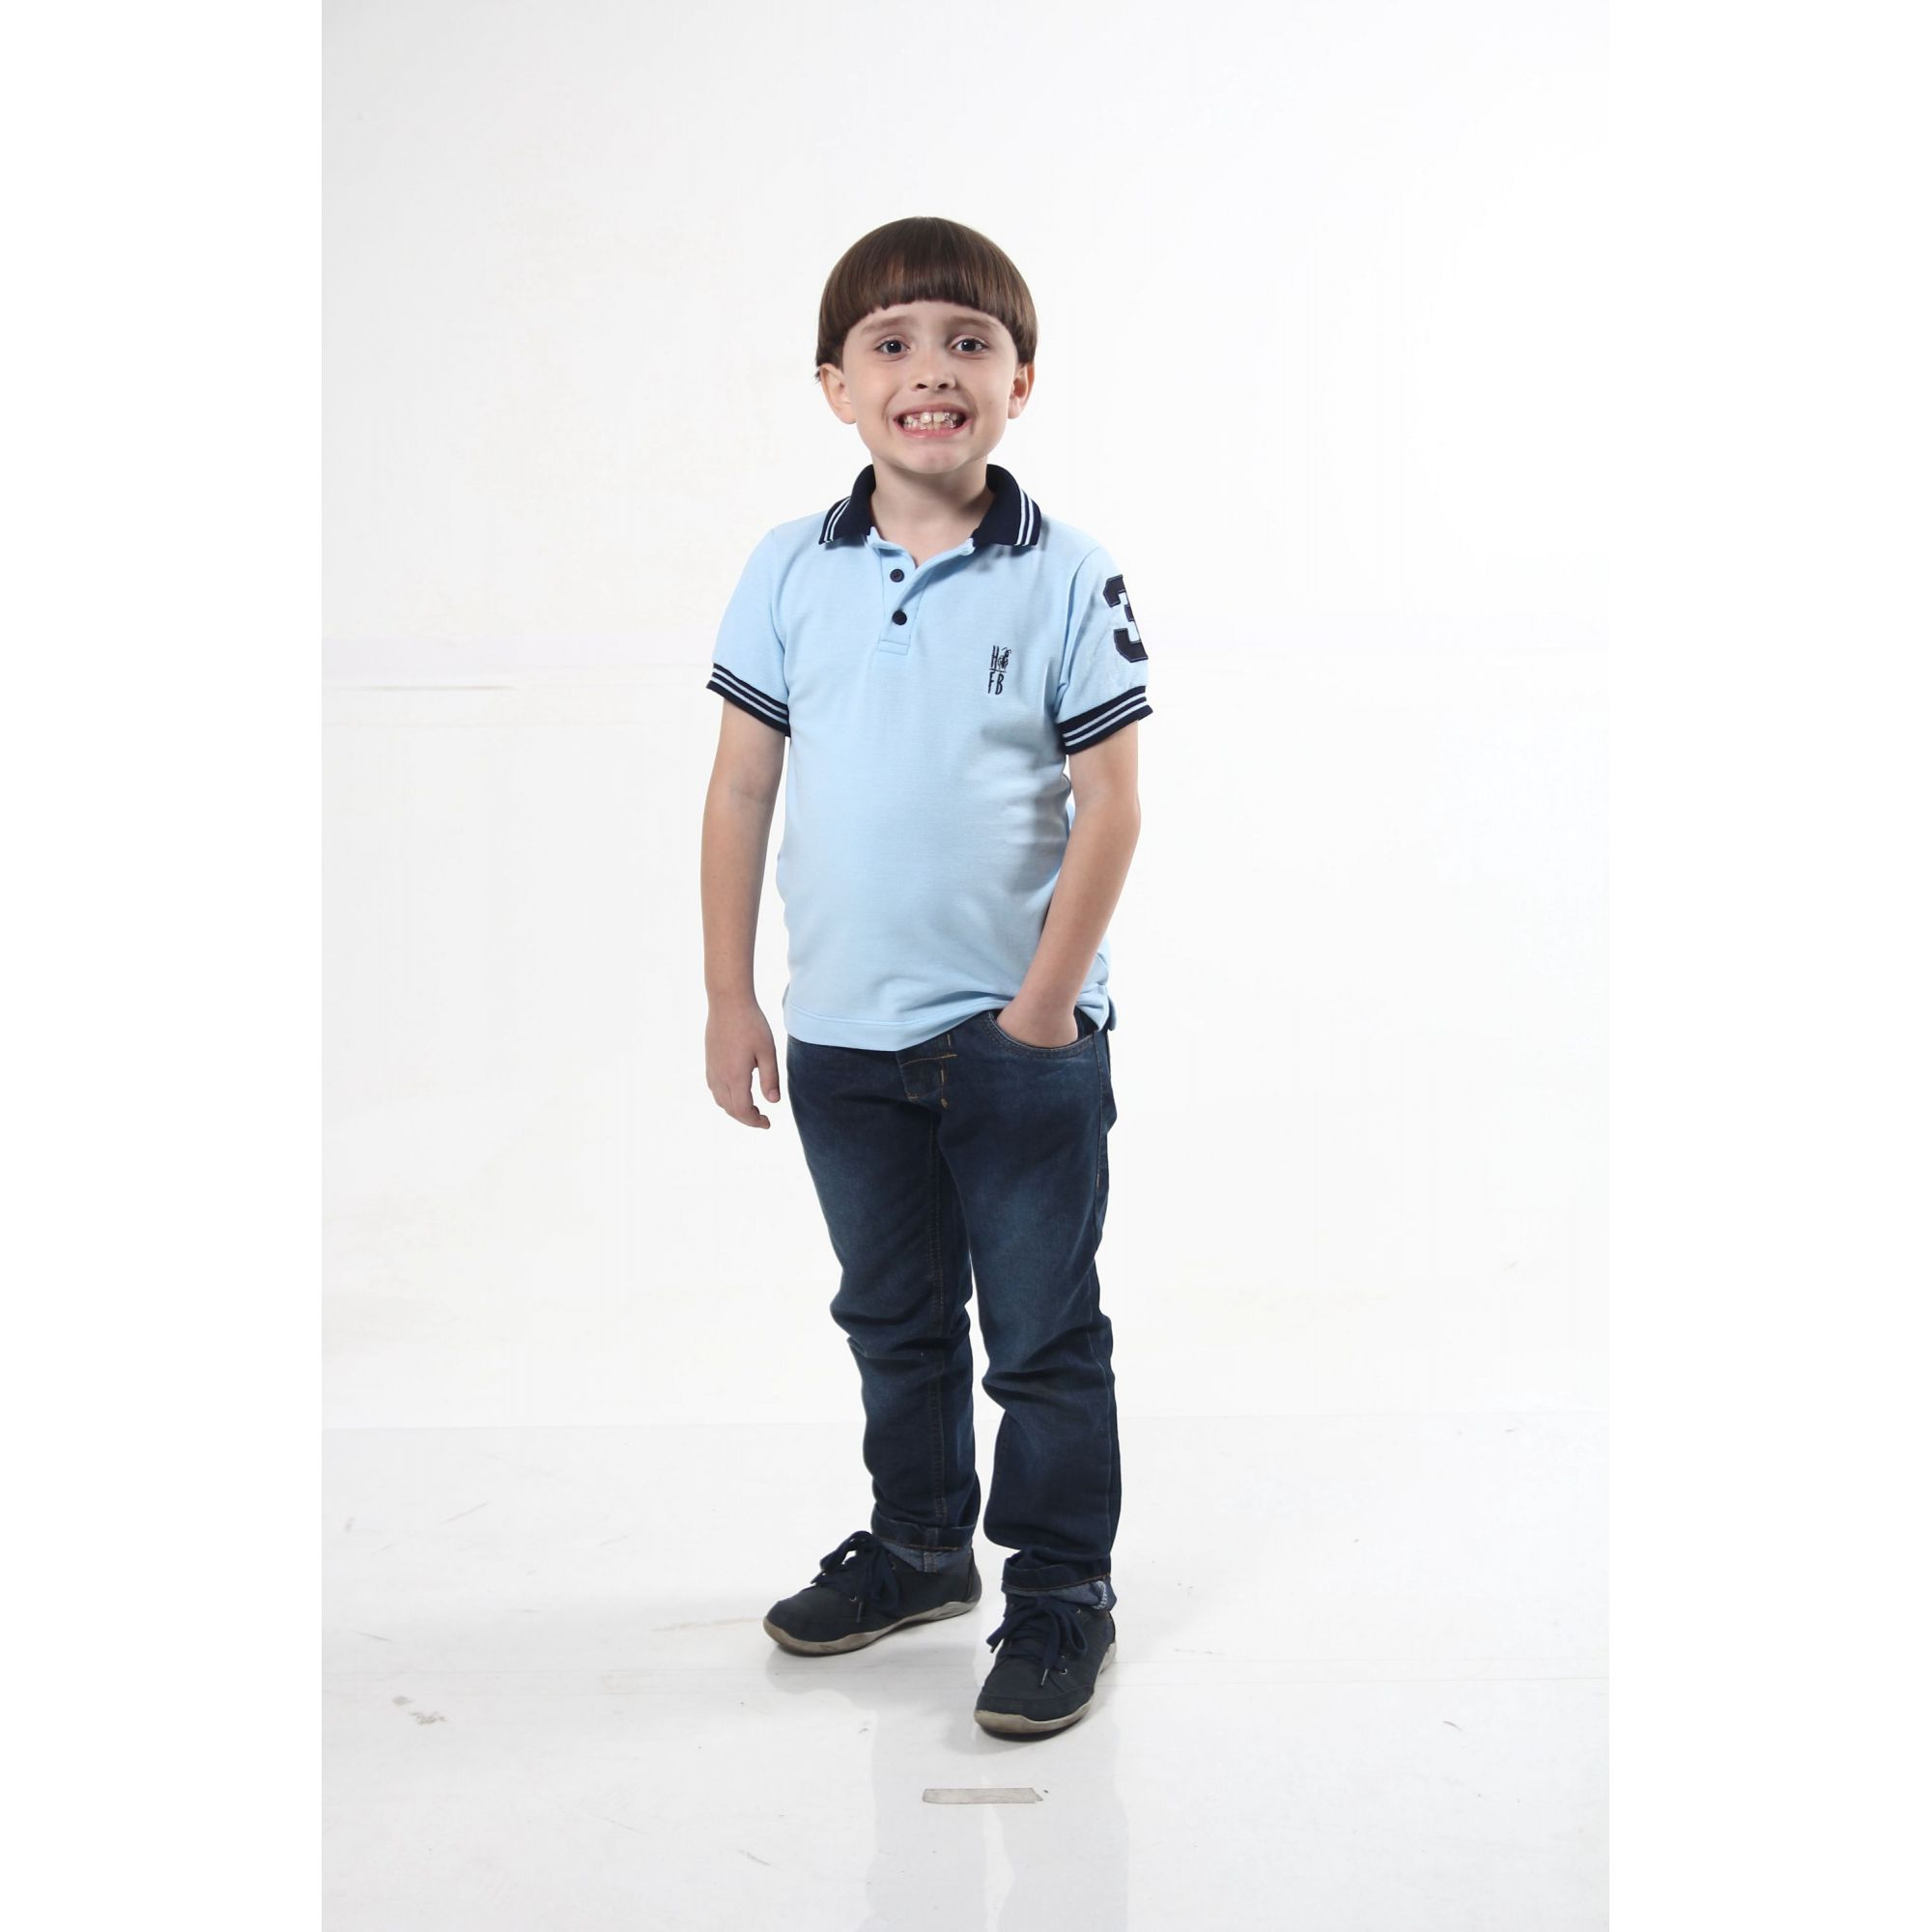 PAI E FILHO > Kit 02 Camisas Polo Azul Nobreza [Coleção Tal Pai Tal Filho]  - Heitor Fashion Brazil